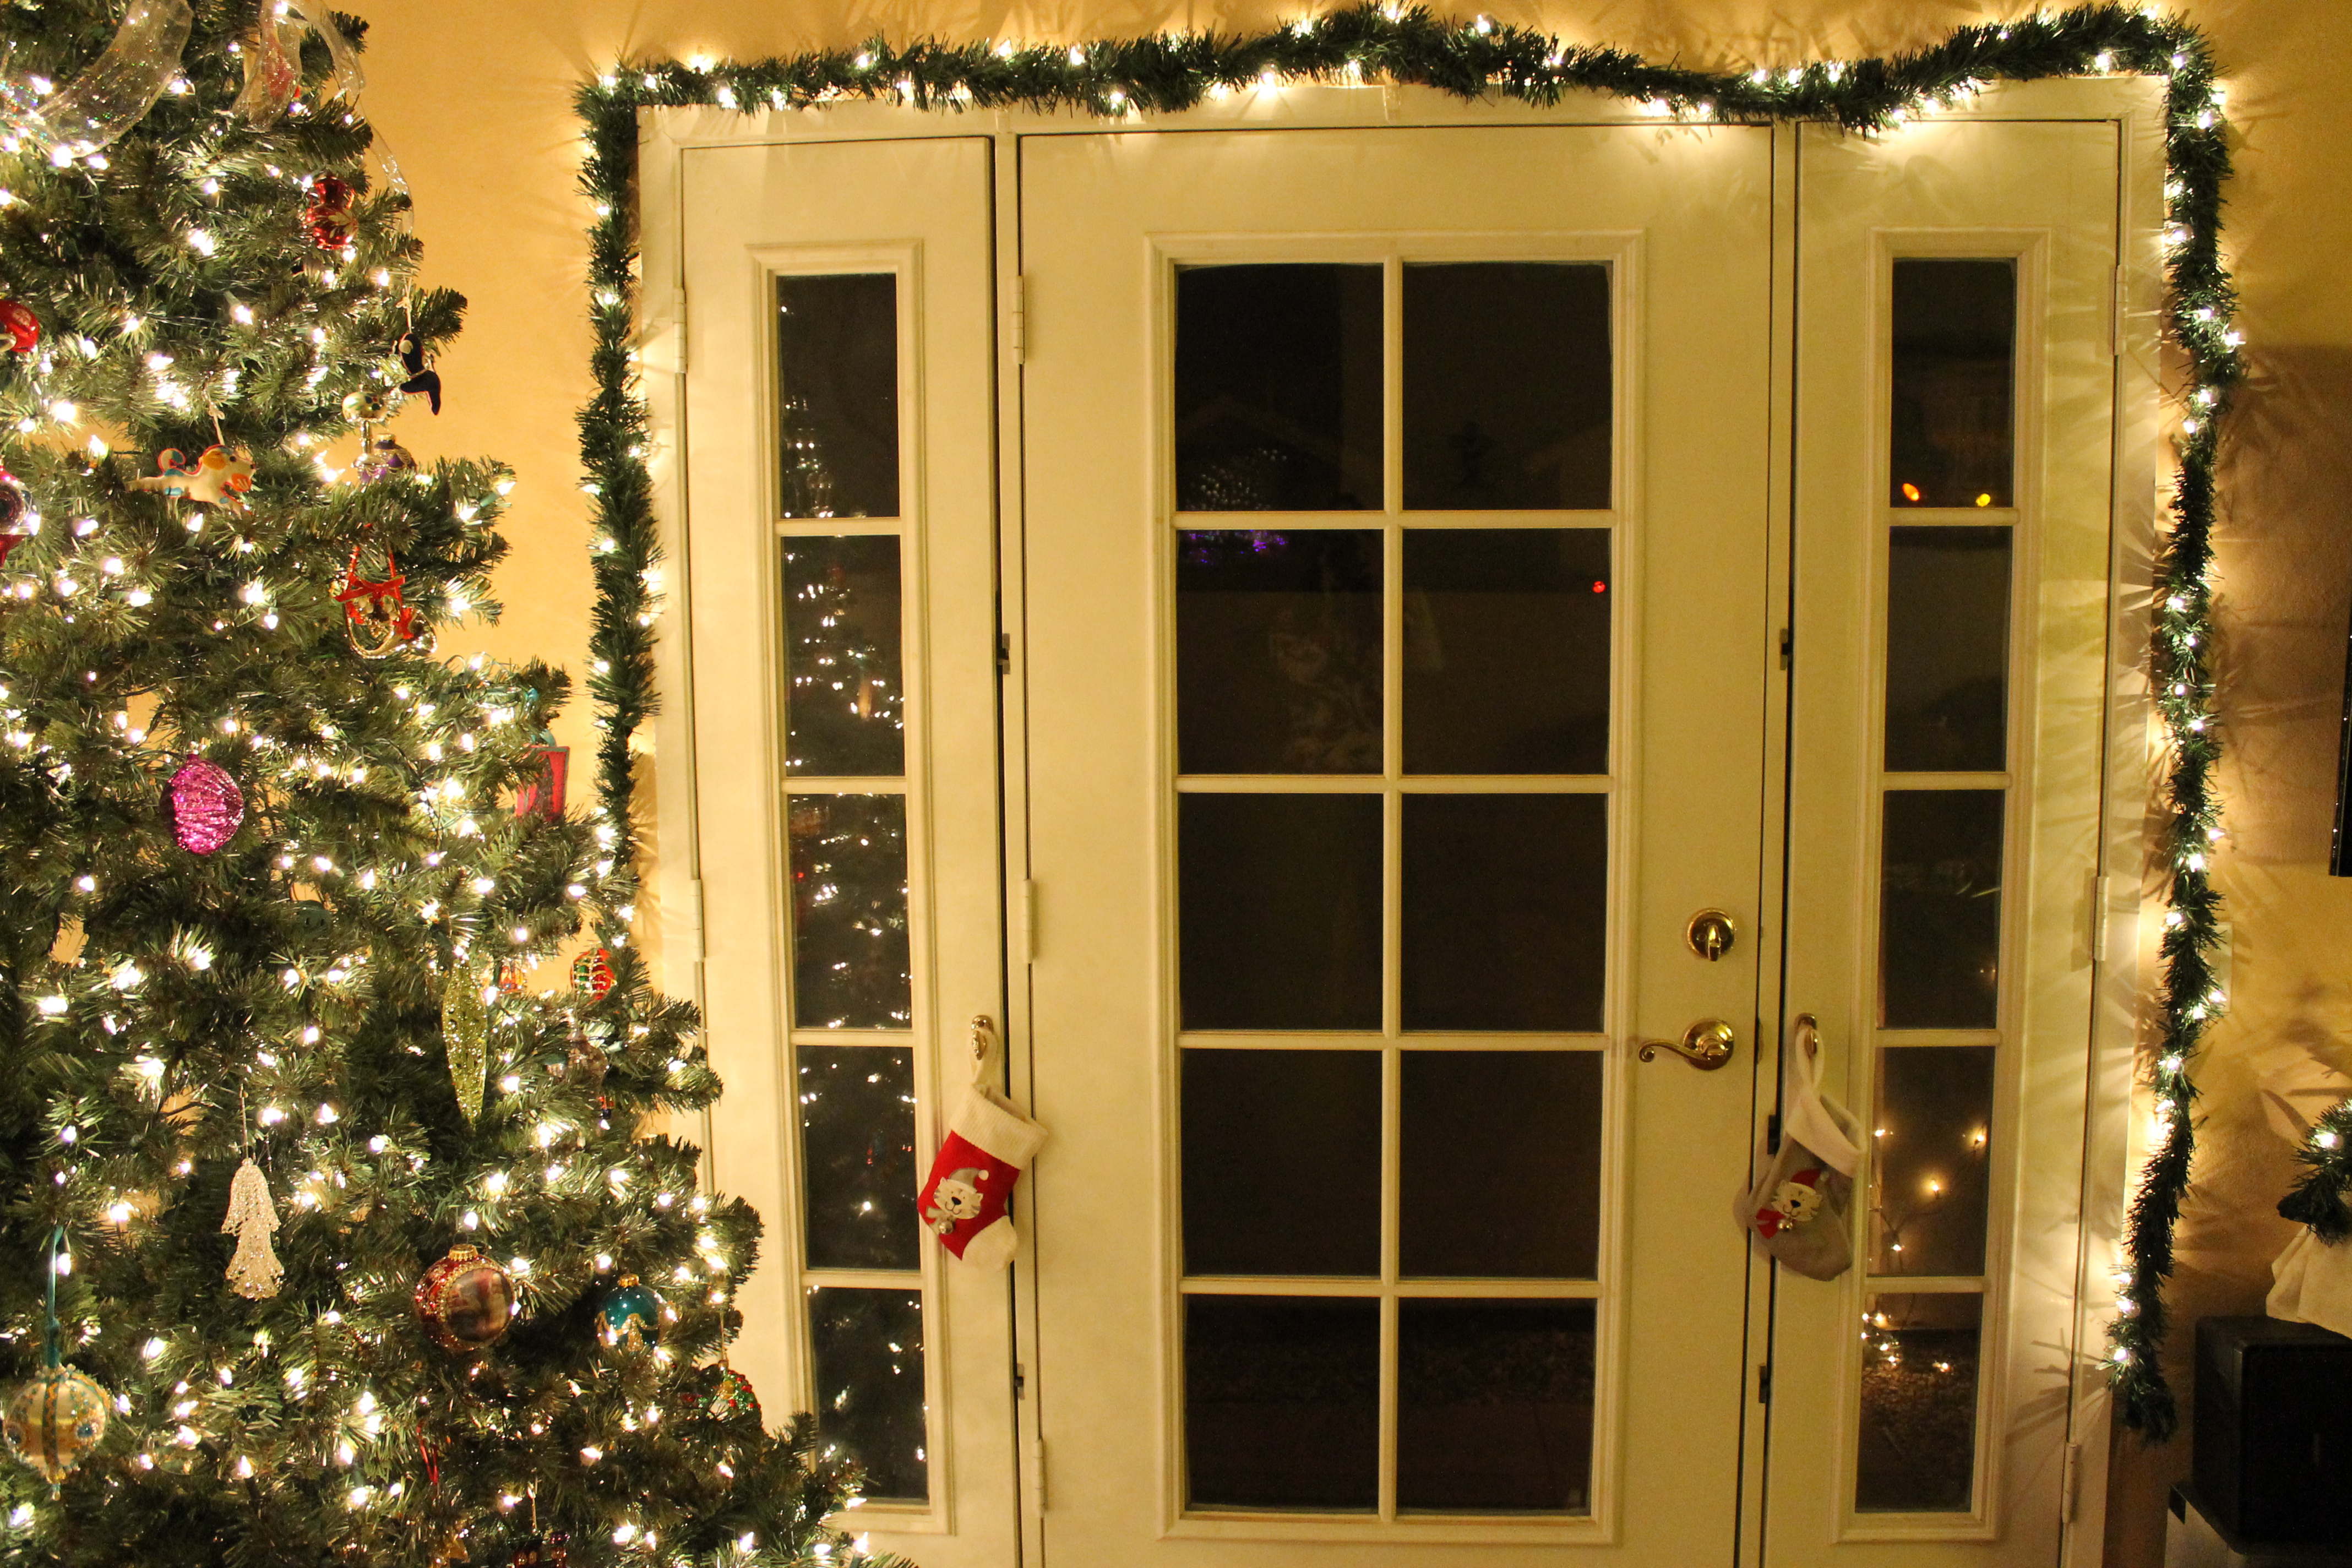 Indoor christmas decorations 2011 trees flowers birds Indoor decoration ideas